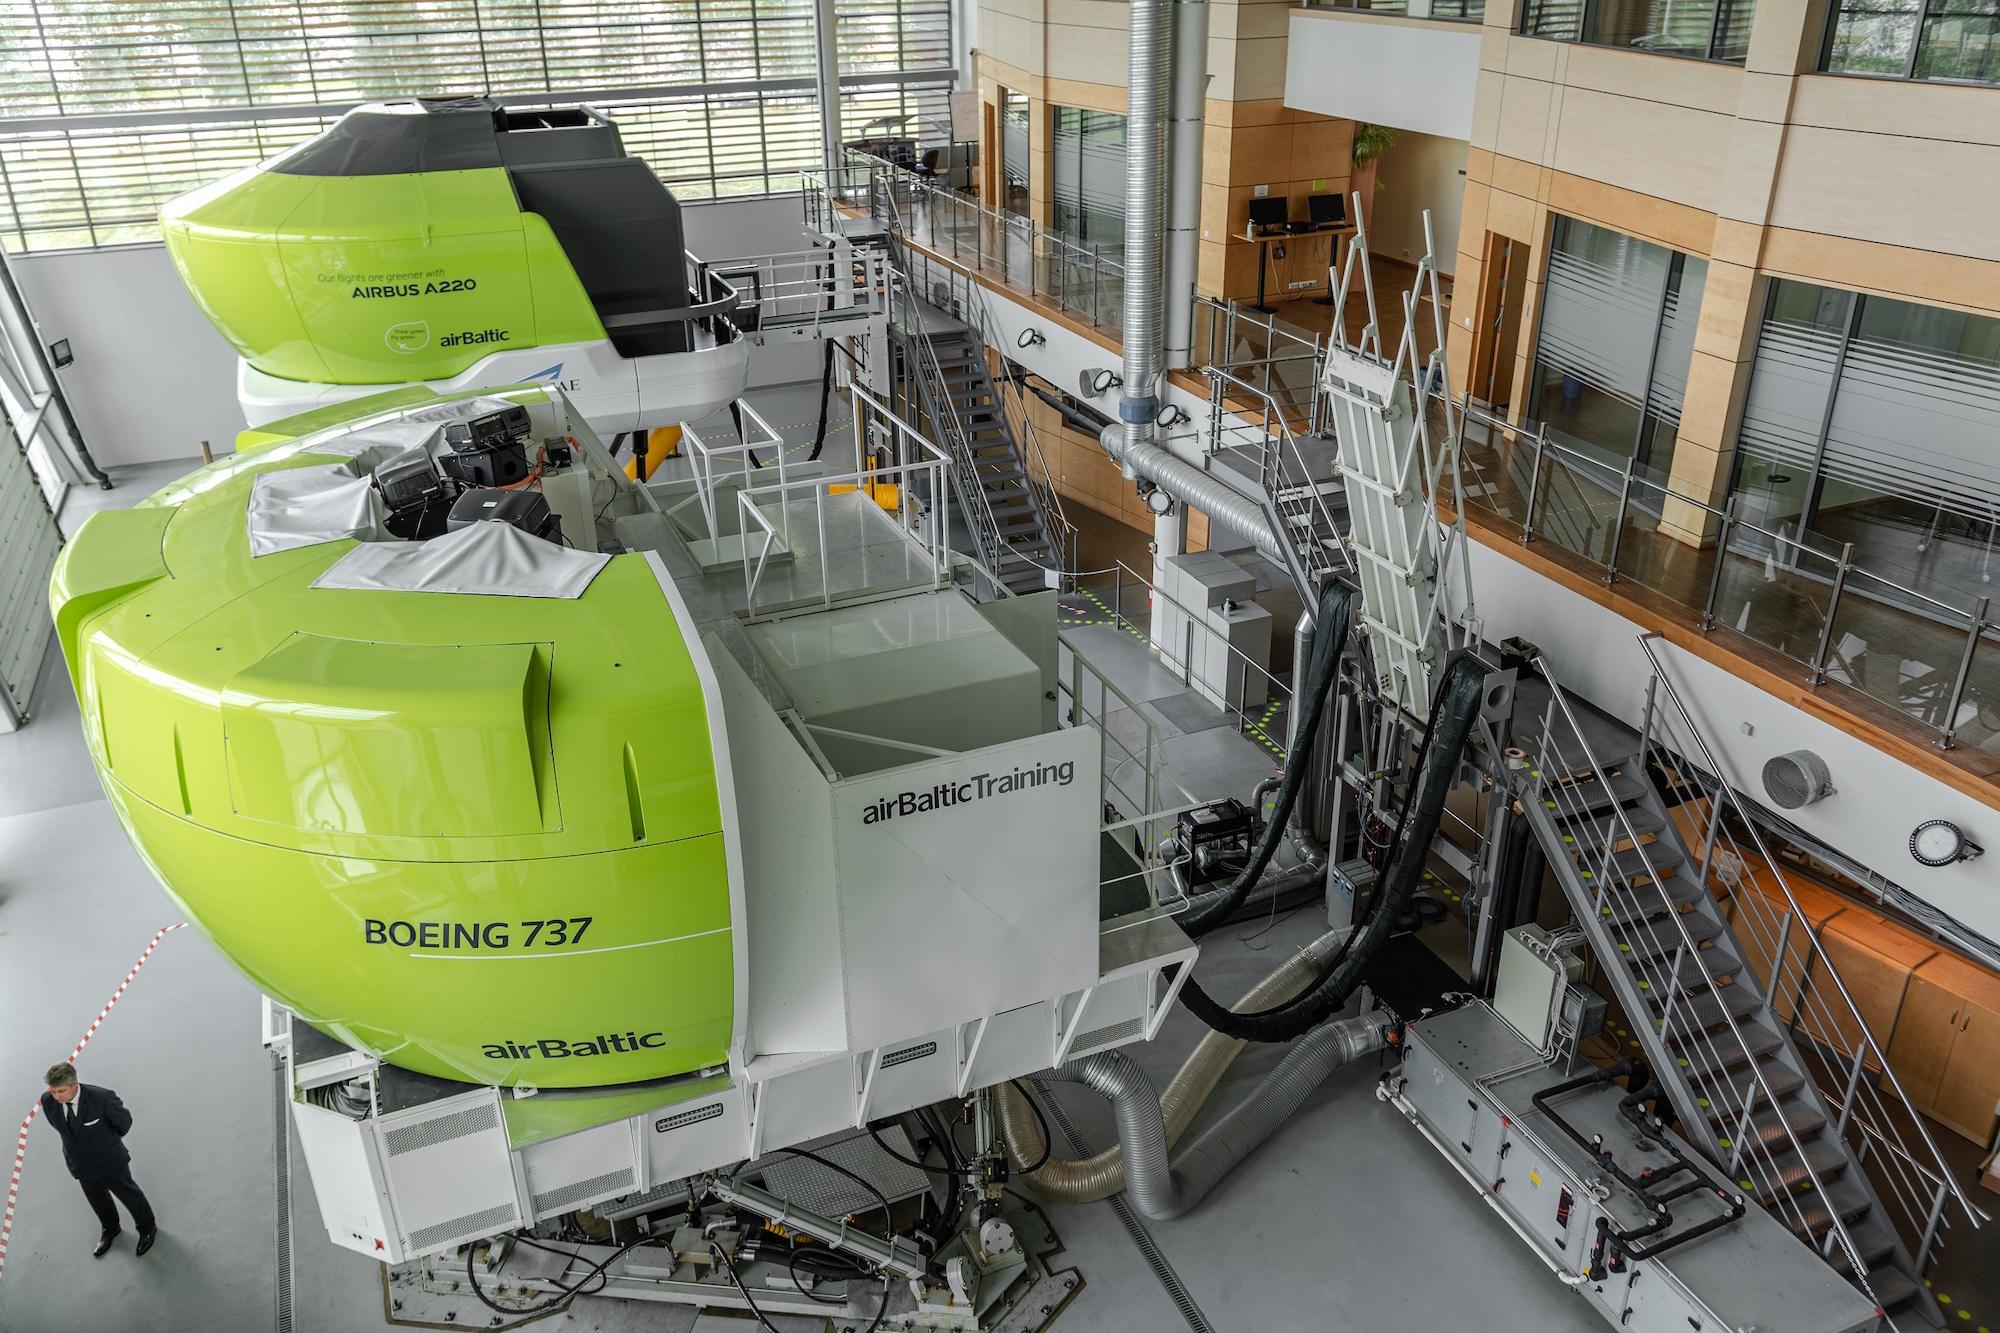 airbaltic, 737 simulator, retirement